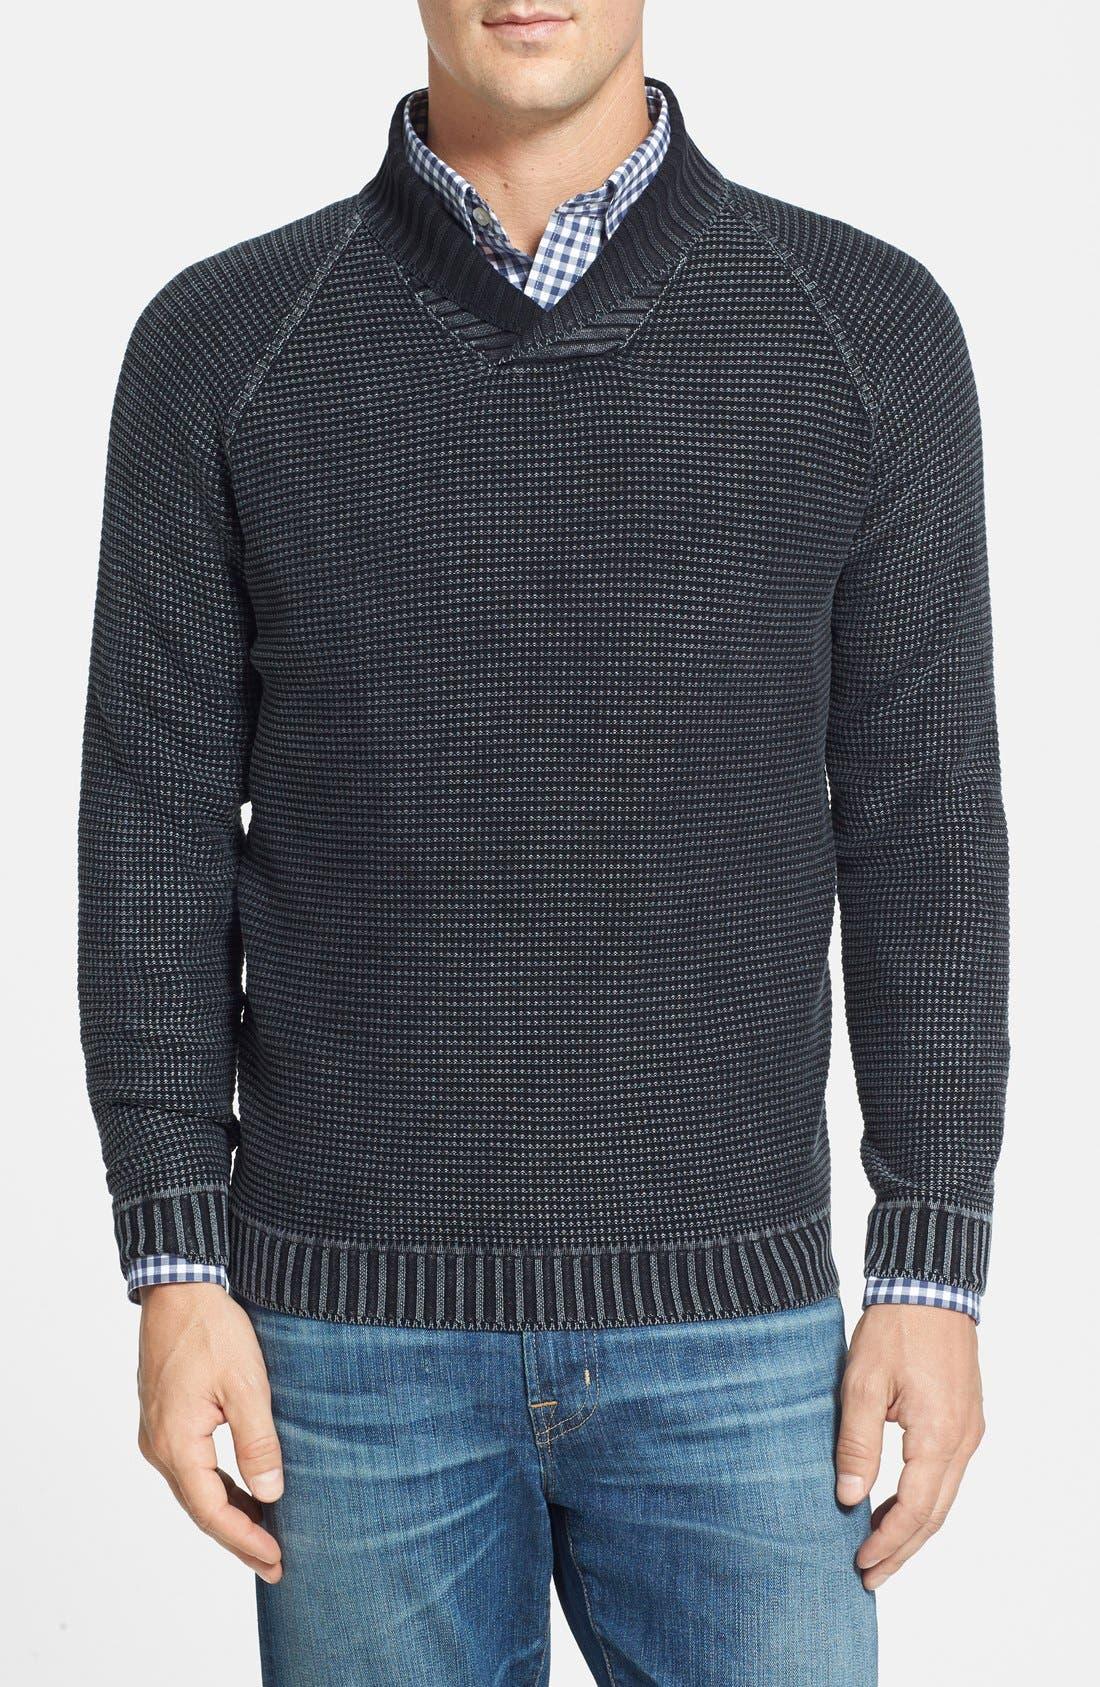 Main Image - Tommy Bahama '1 Island' Shawl Collar Sweater